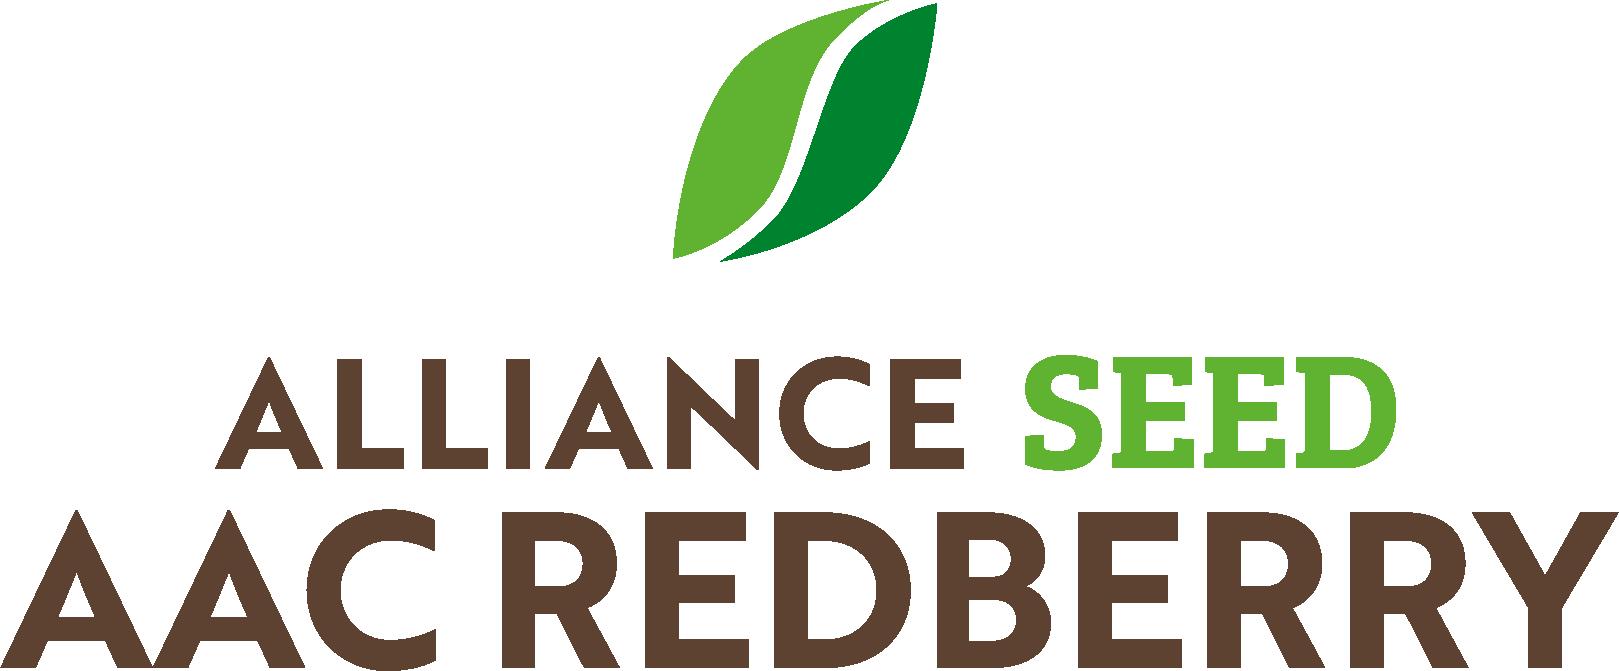 ALS_AAC_Redberry_Logo_RGB